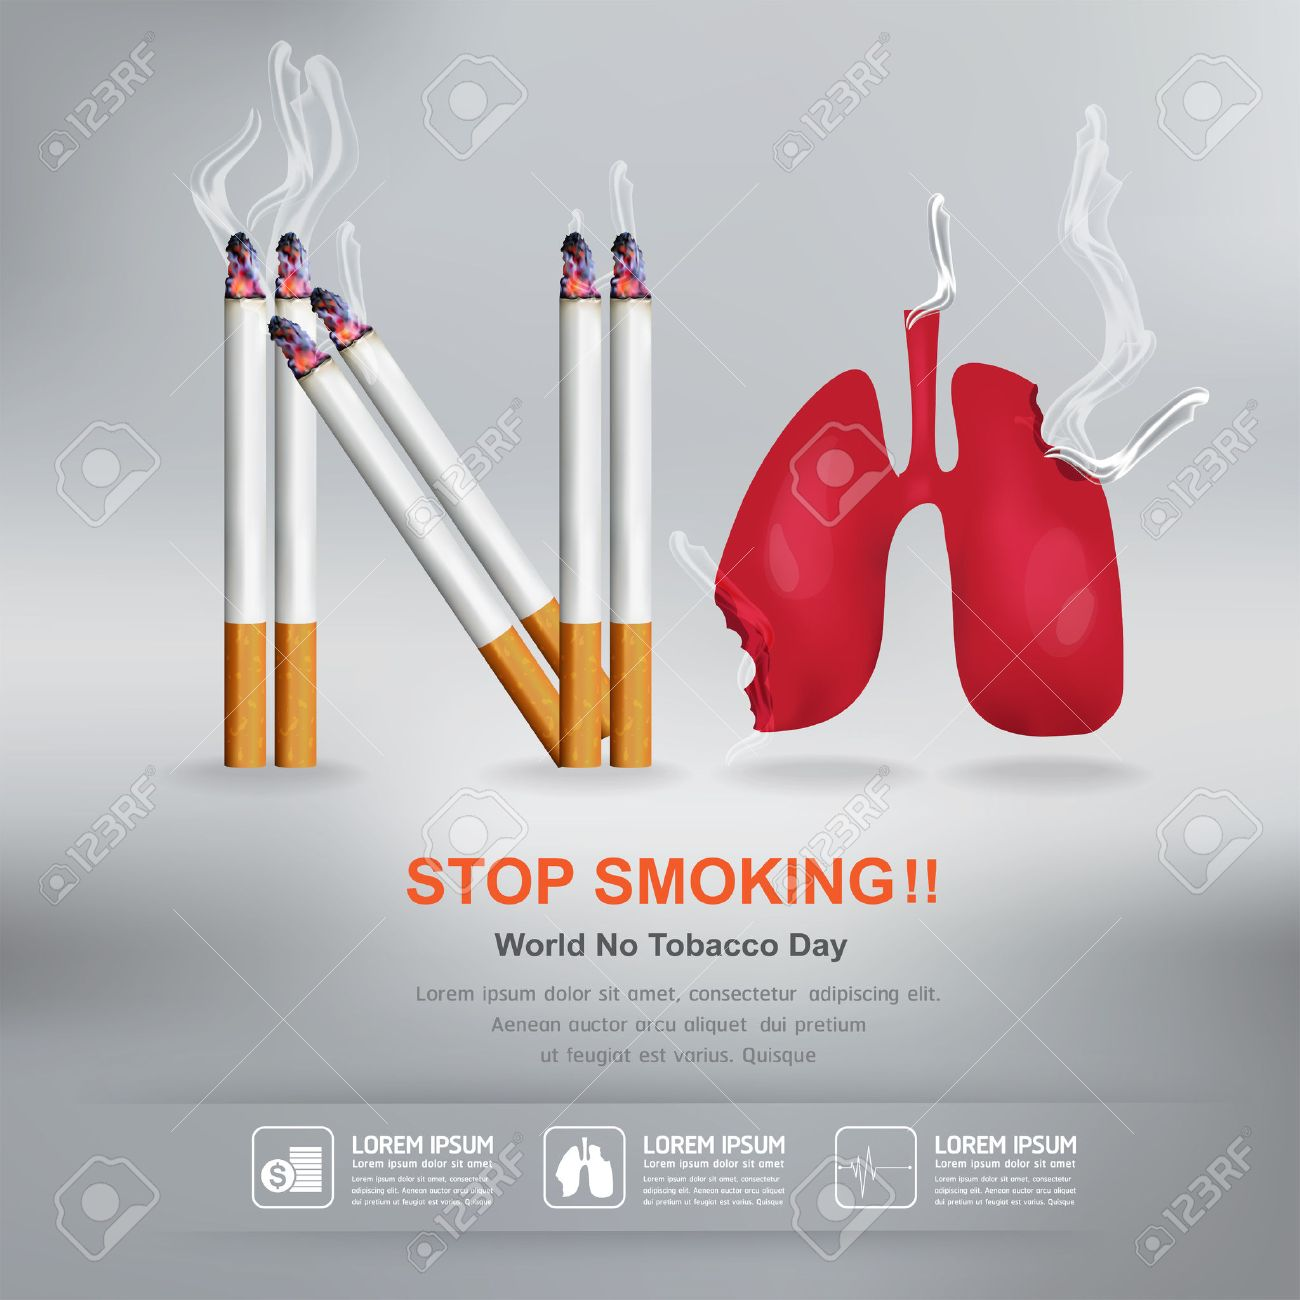 World No Tobacco Day Vector Concept Stop Smoking - 50203778